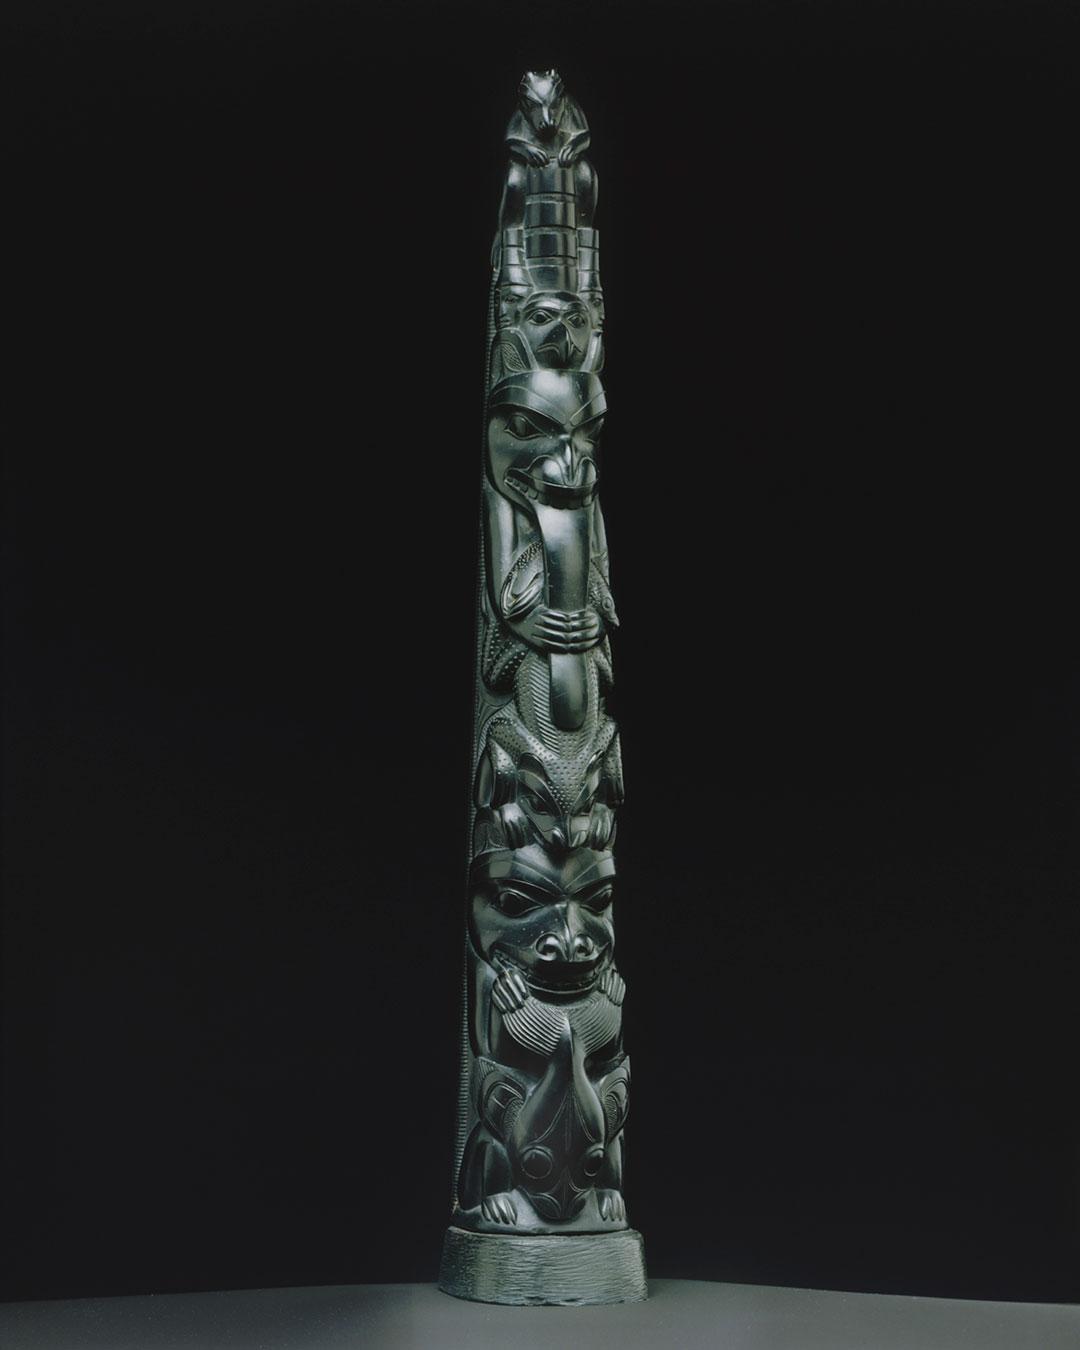 Object of the Week: Model Totem Pole